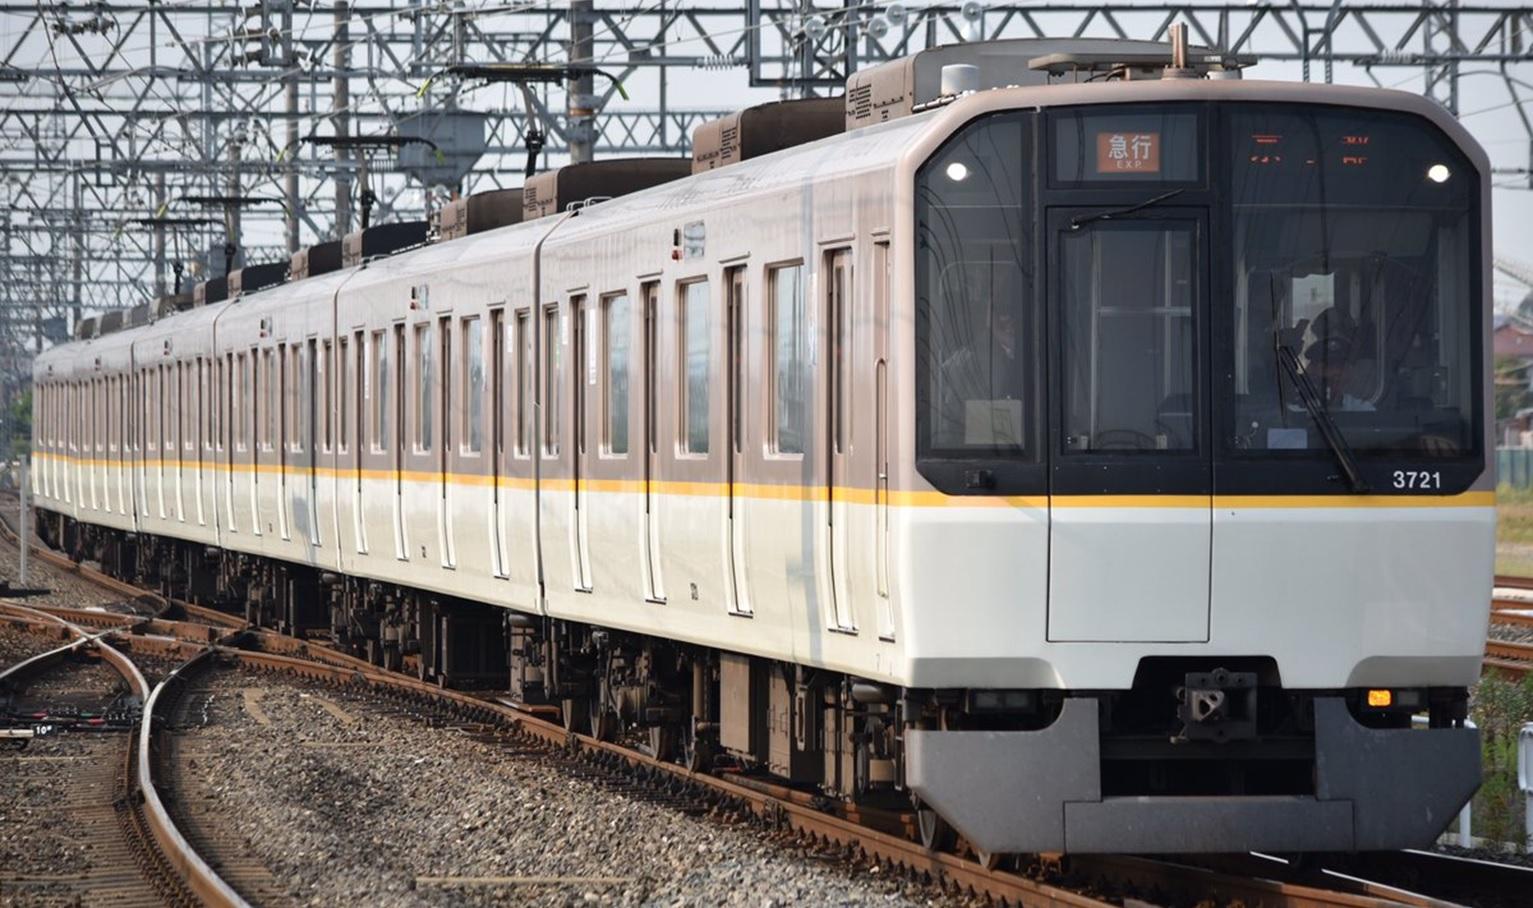 https://upload.wikimedia.org/wikipedia/commons/9/9e/Kintetsu_3220_KL21_Express.jpg